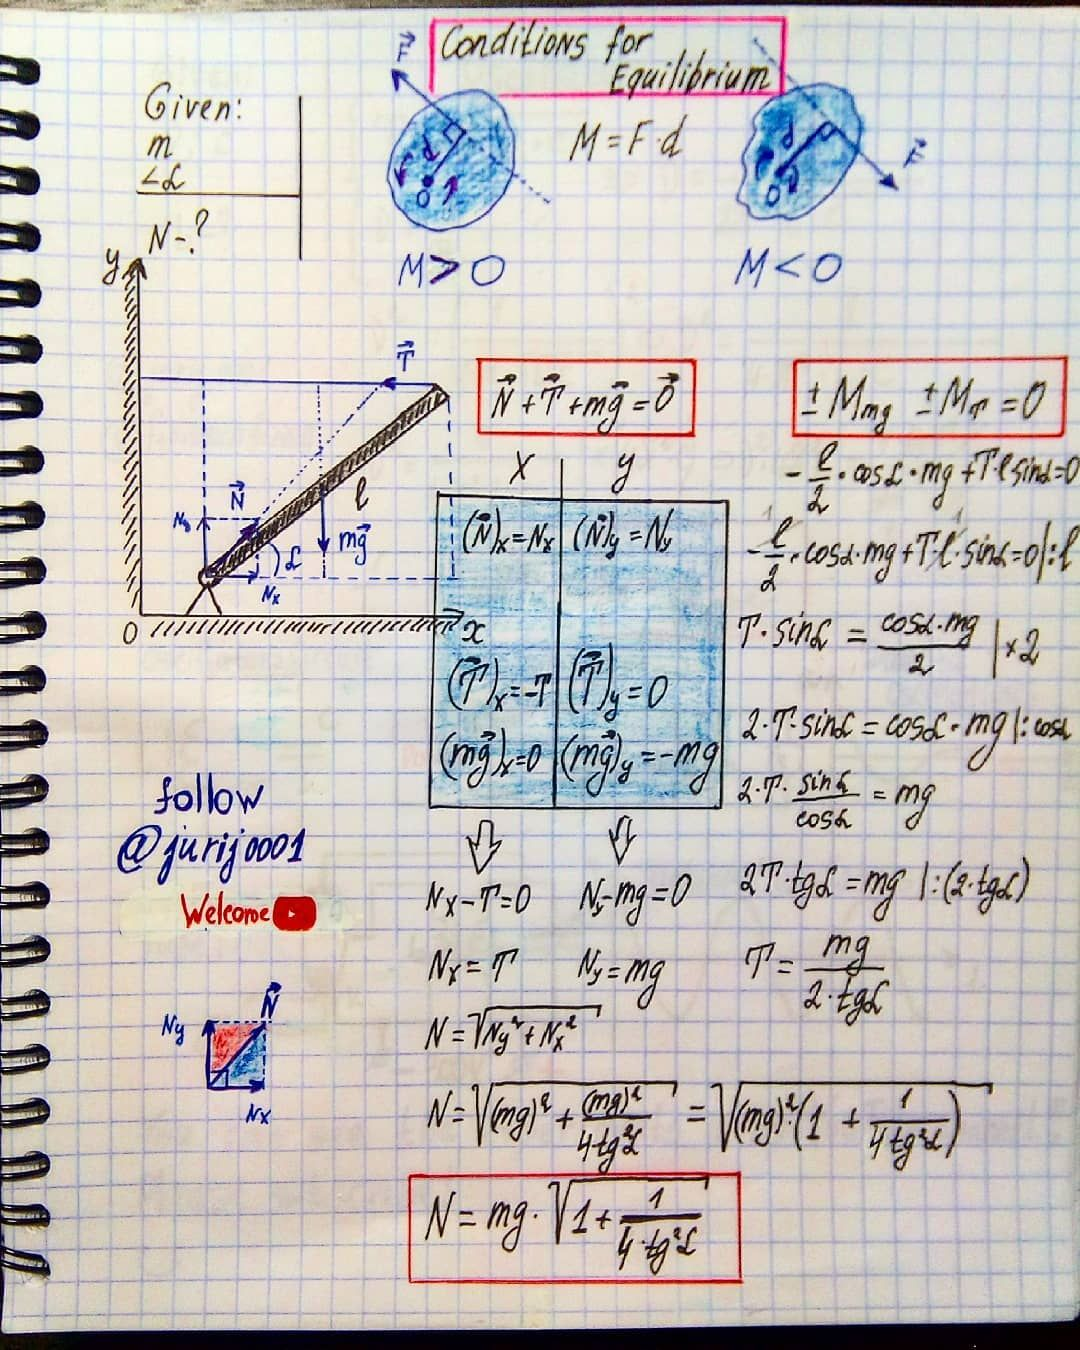 171 Me Gusta 2 Comentarios Jurius Phisicist Juriusphisicist En Instagram Condition For Equilibri Physics And Mathematics Physics Concepts Physics Notes